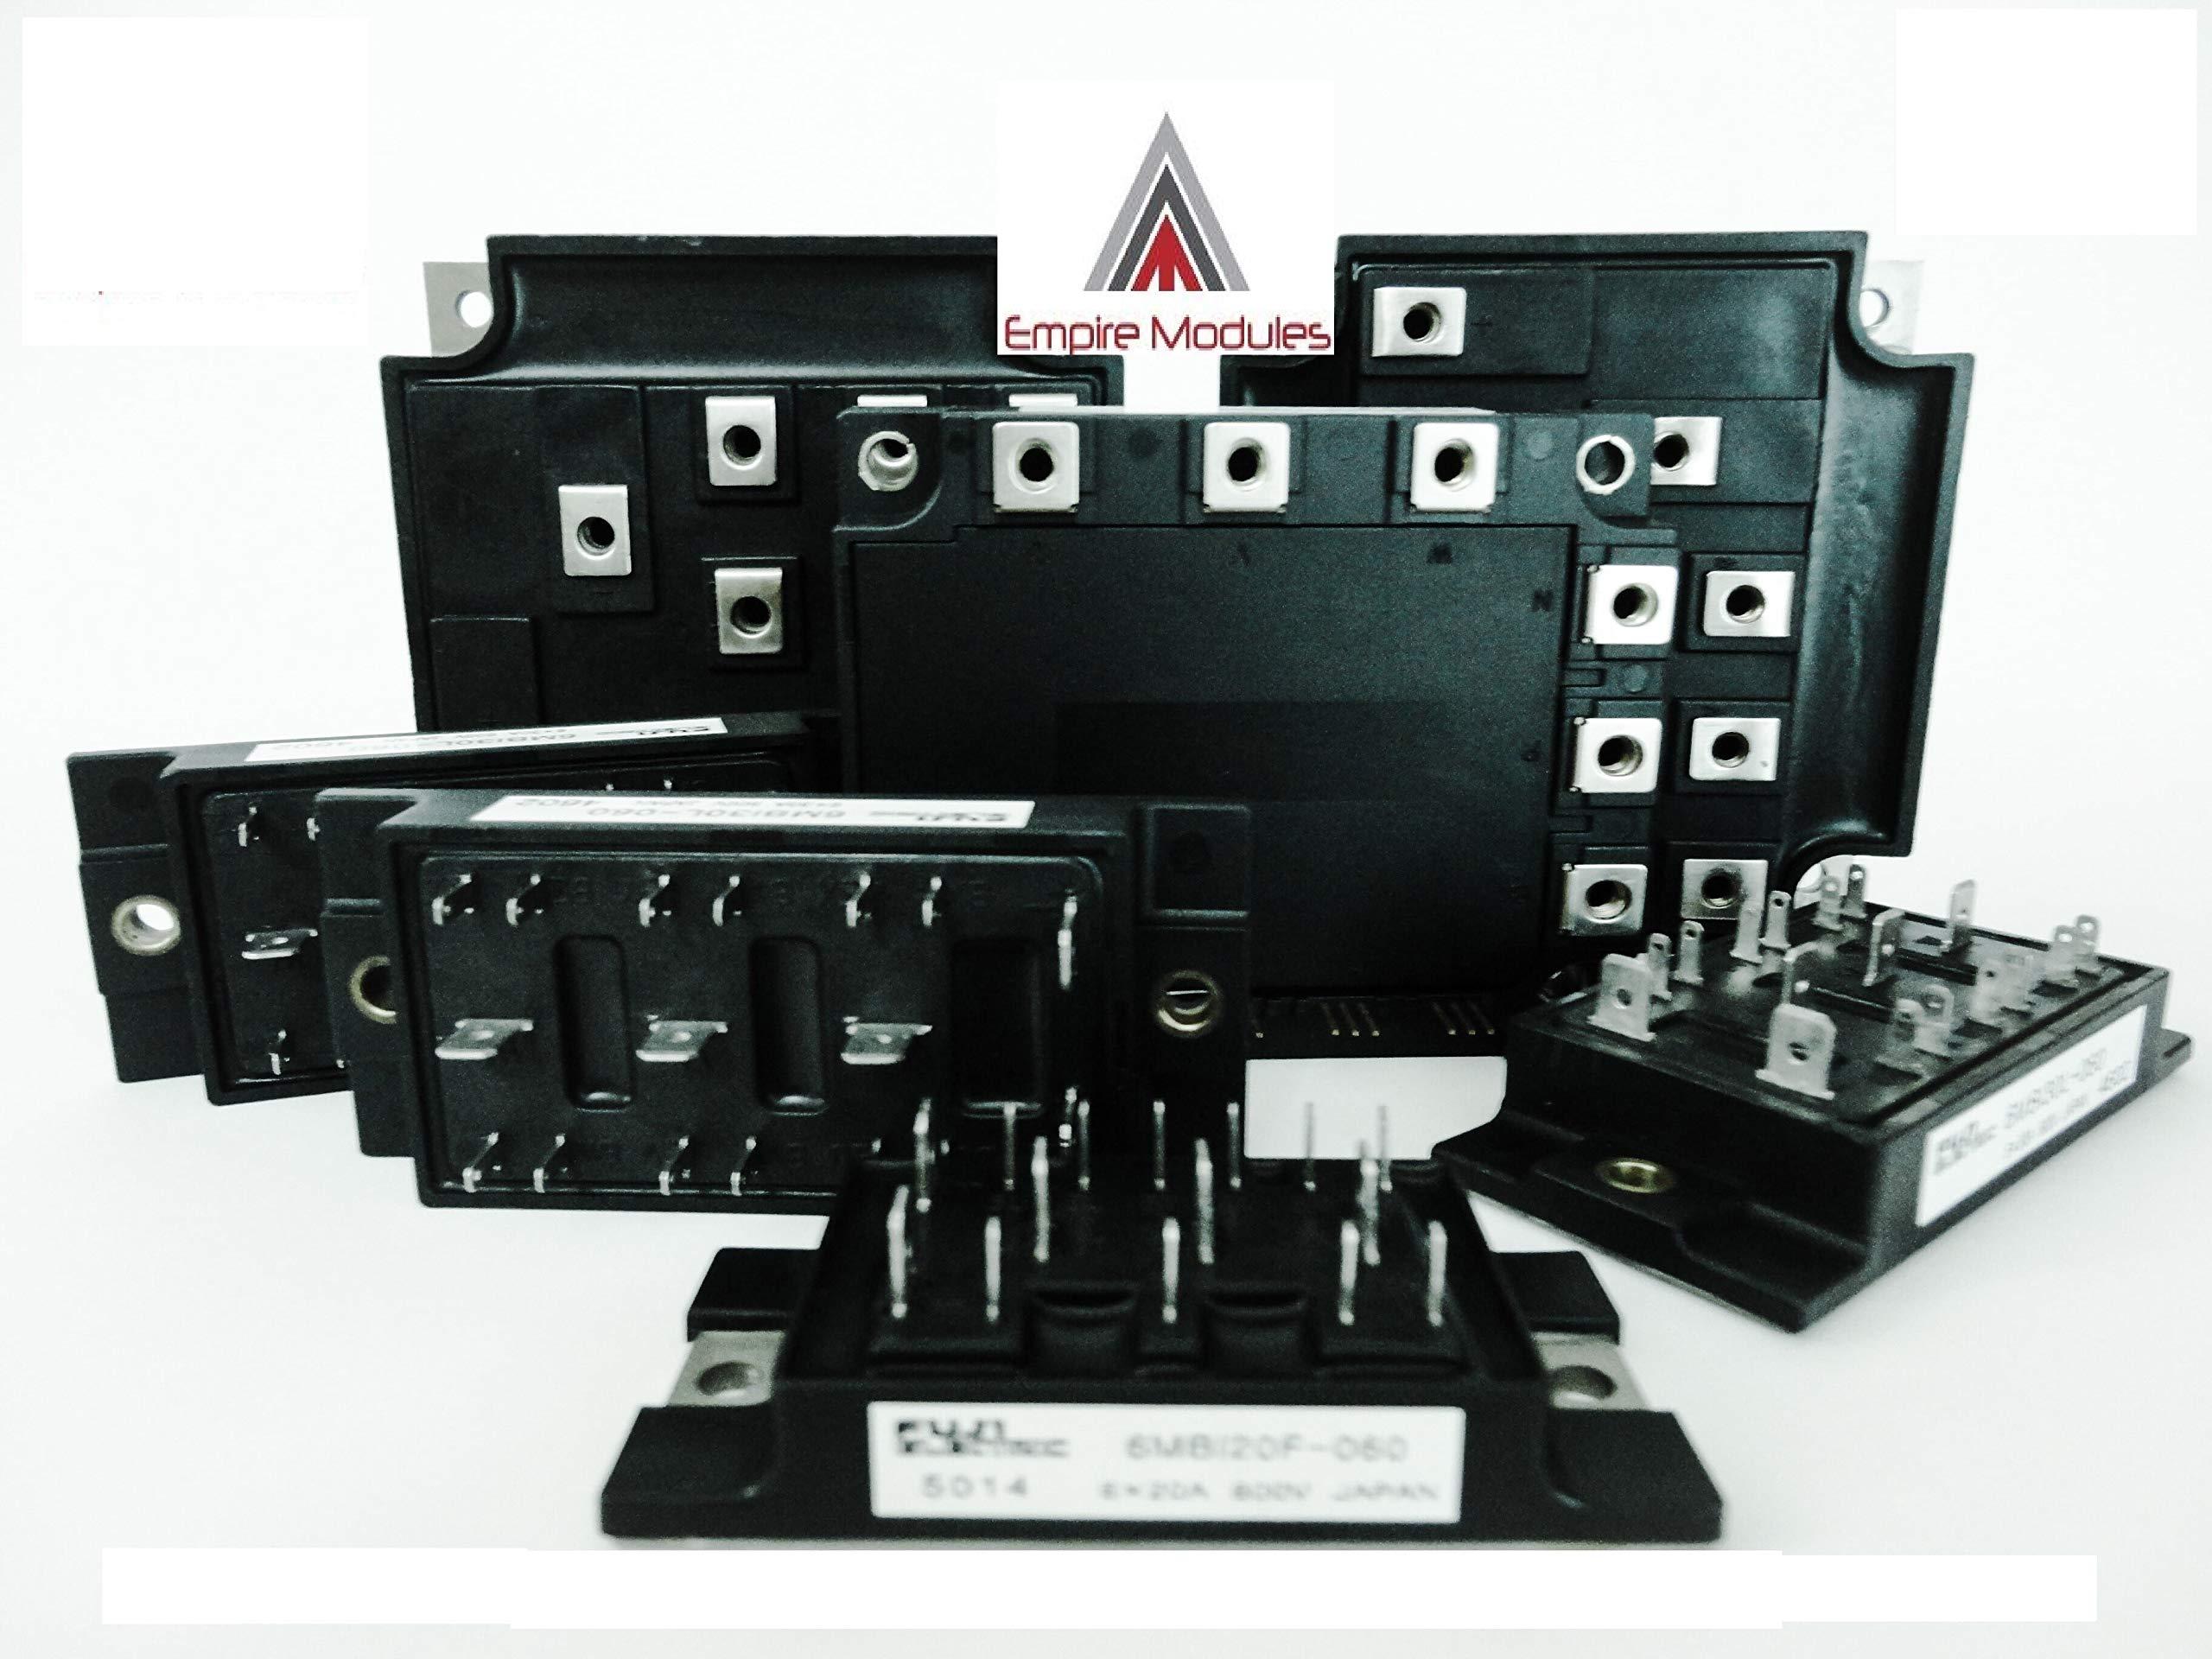 POWEREX CS240650 DIODE MODULE, 600V, 50A, POW-R-BLOK by Powerex